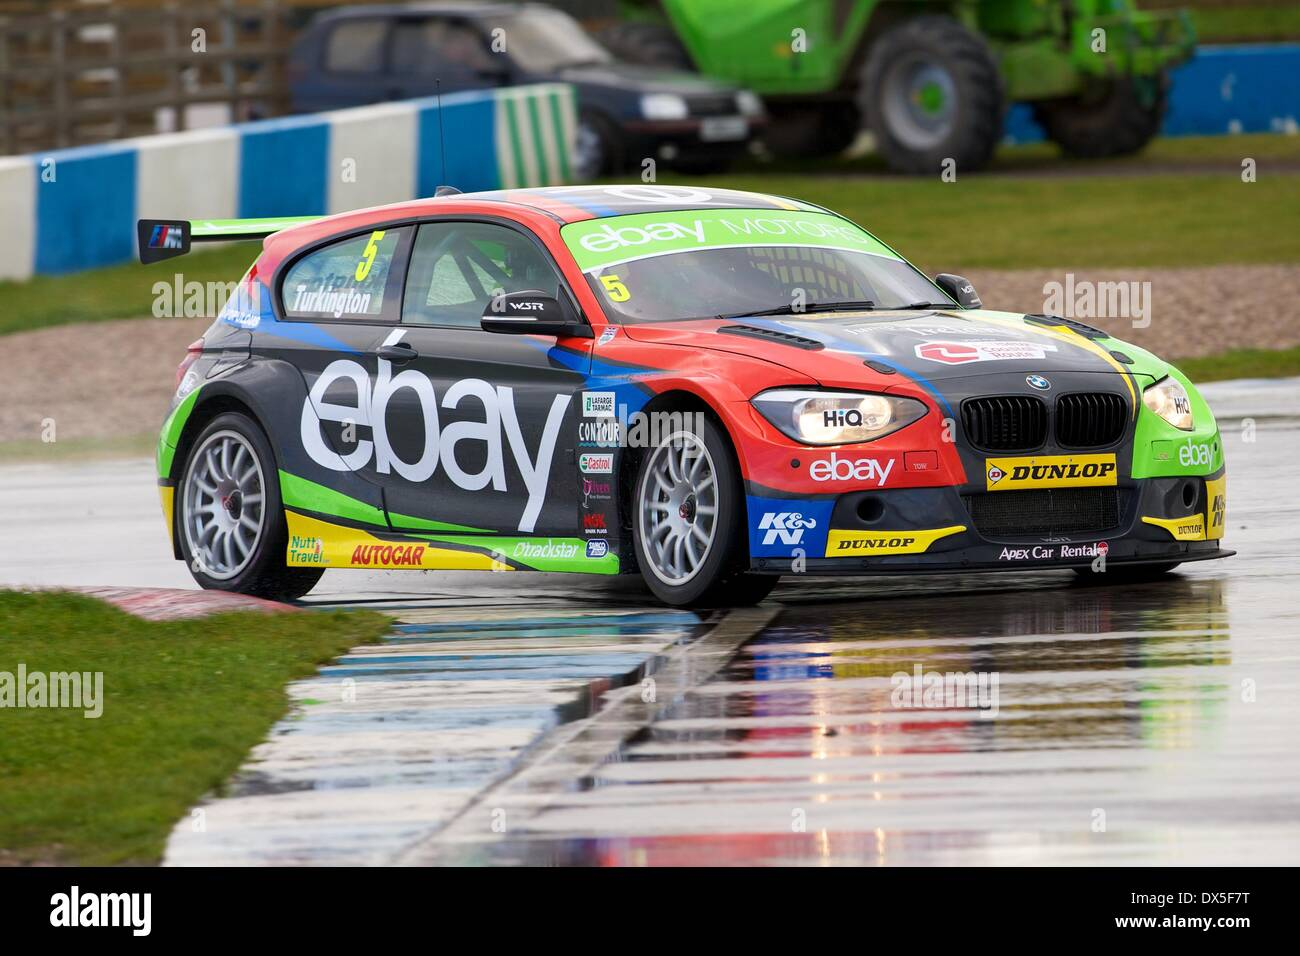 Donington, UK. 18th Mar, 2014. Colin Turkington driving his eBay ...